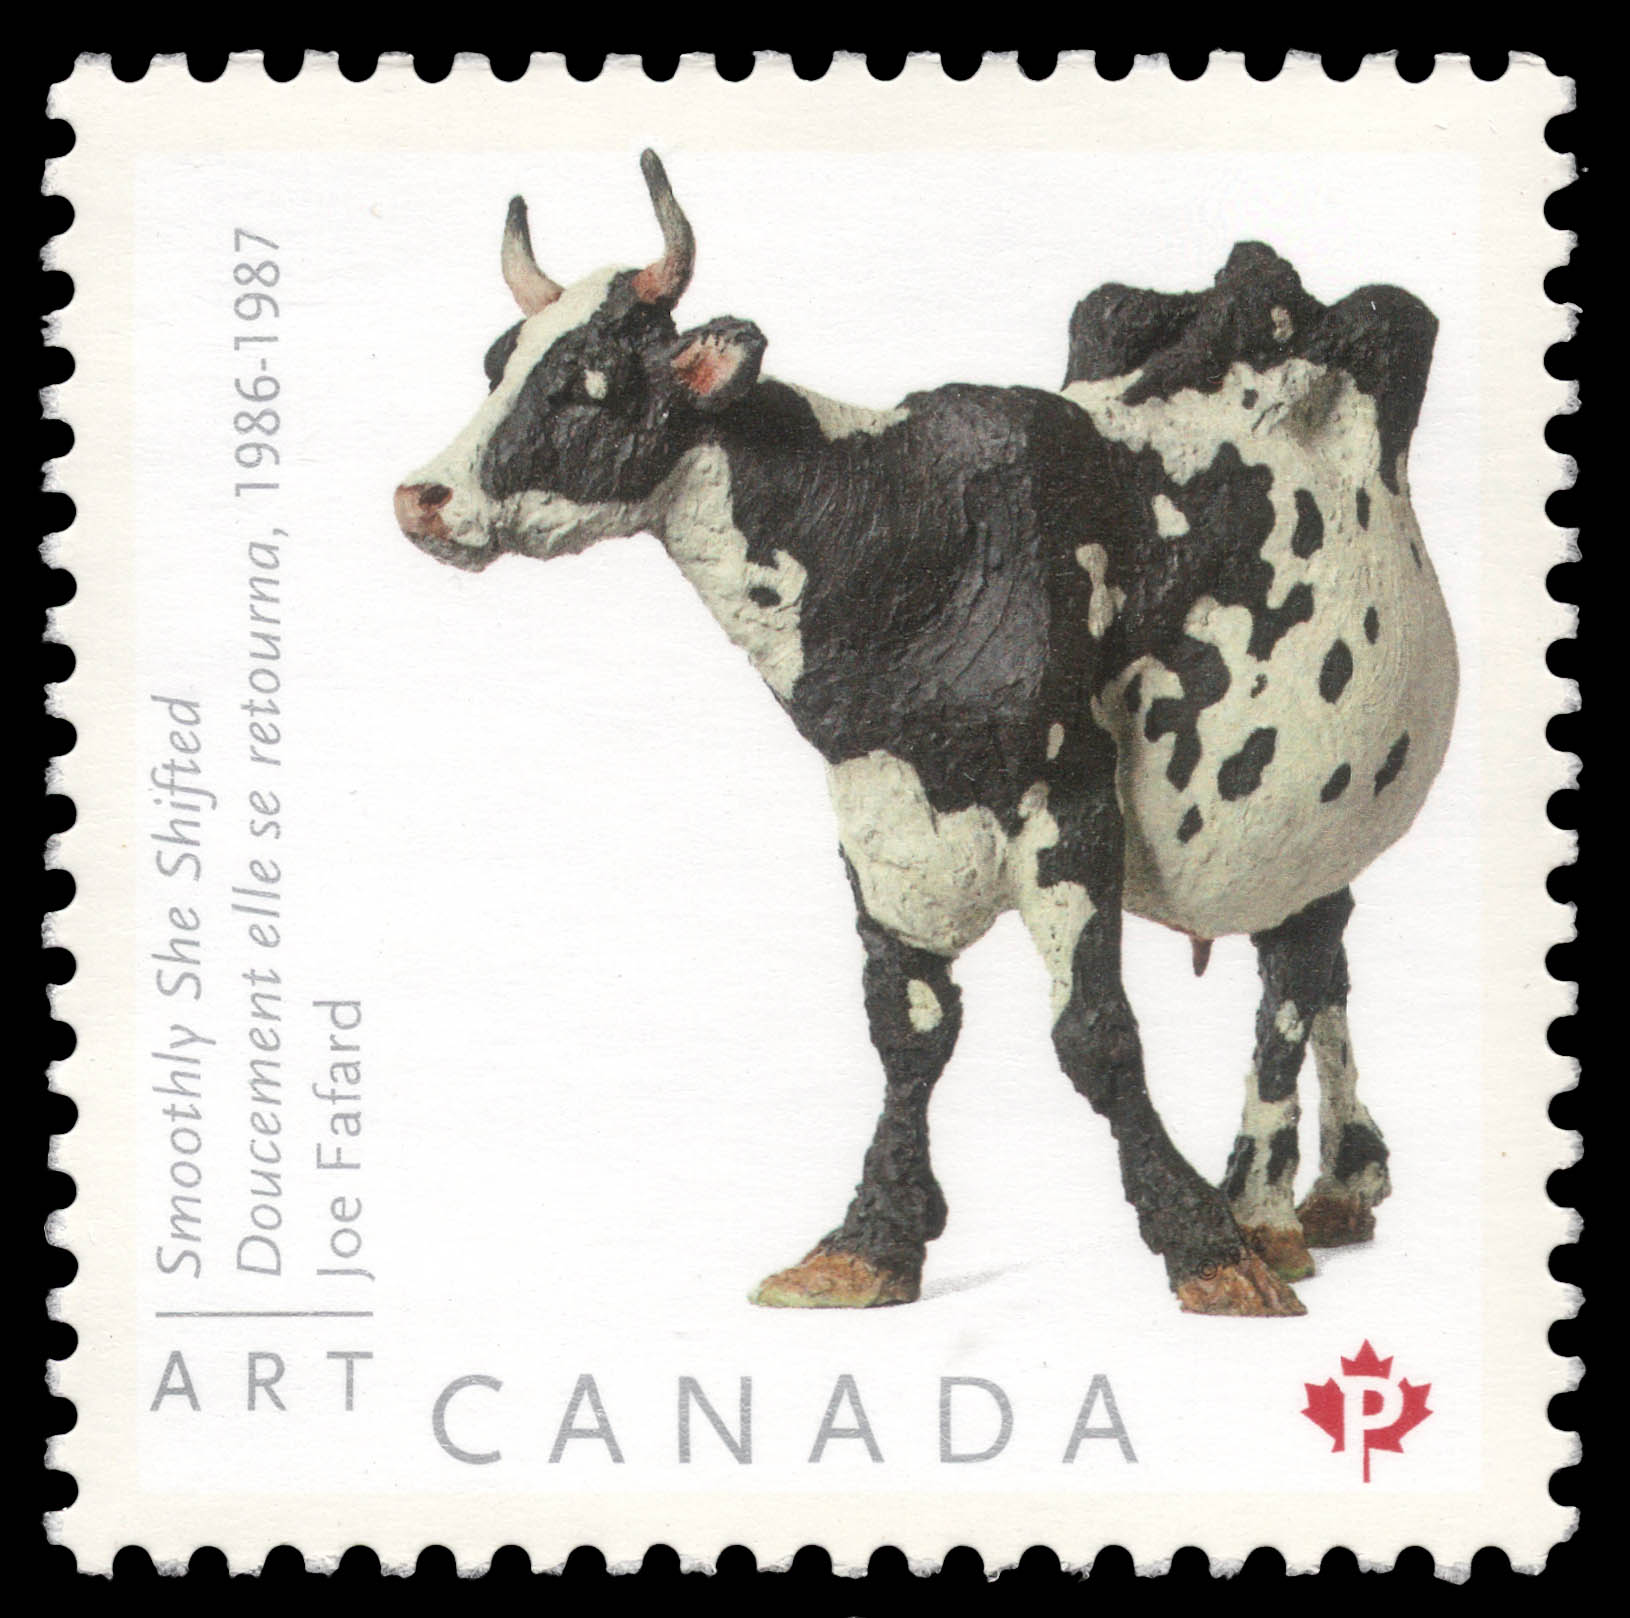 Smoothly She Shifted - Joe Fafard Canada Postage Stamp | Art Canada